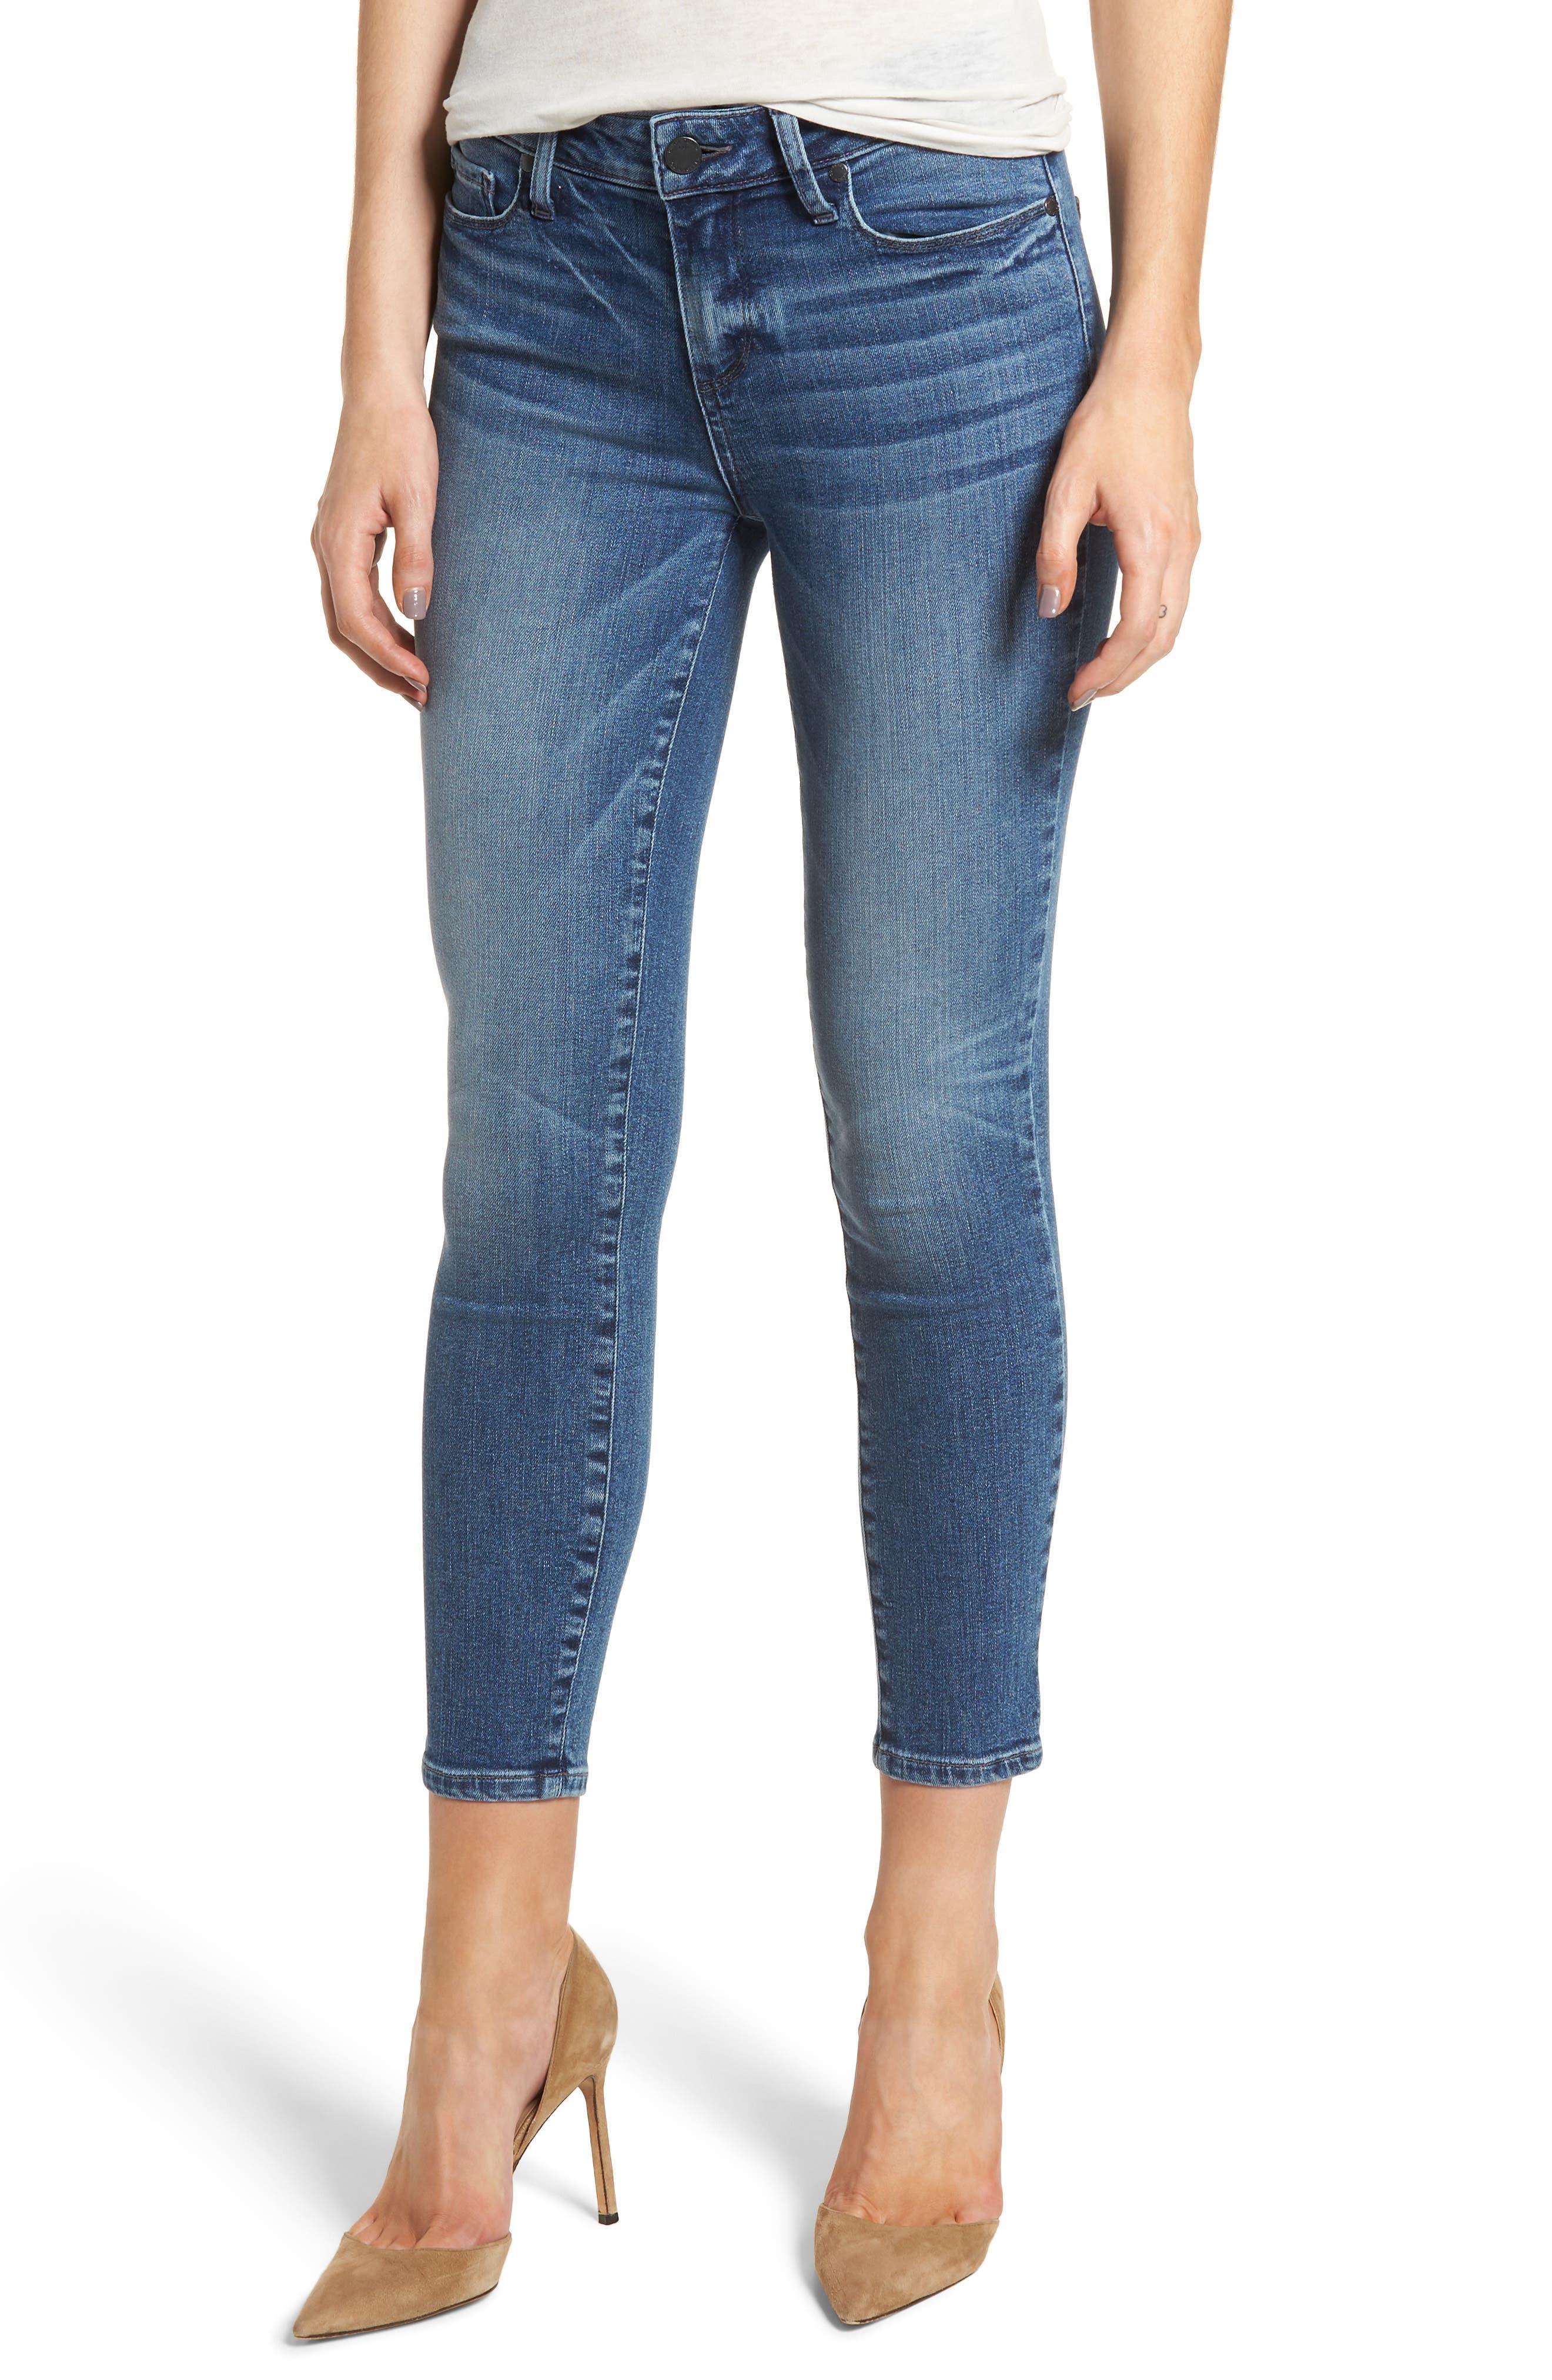 Transcend Vintage - Verdugo Crop Ultra Skinny Jeans,                         Main,                         color, Bloomfield